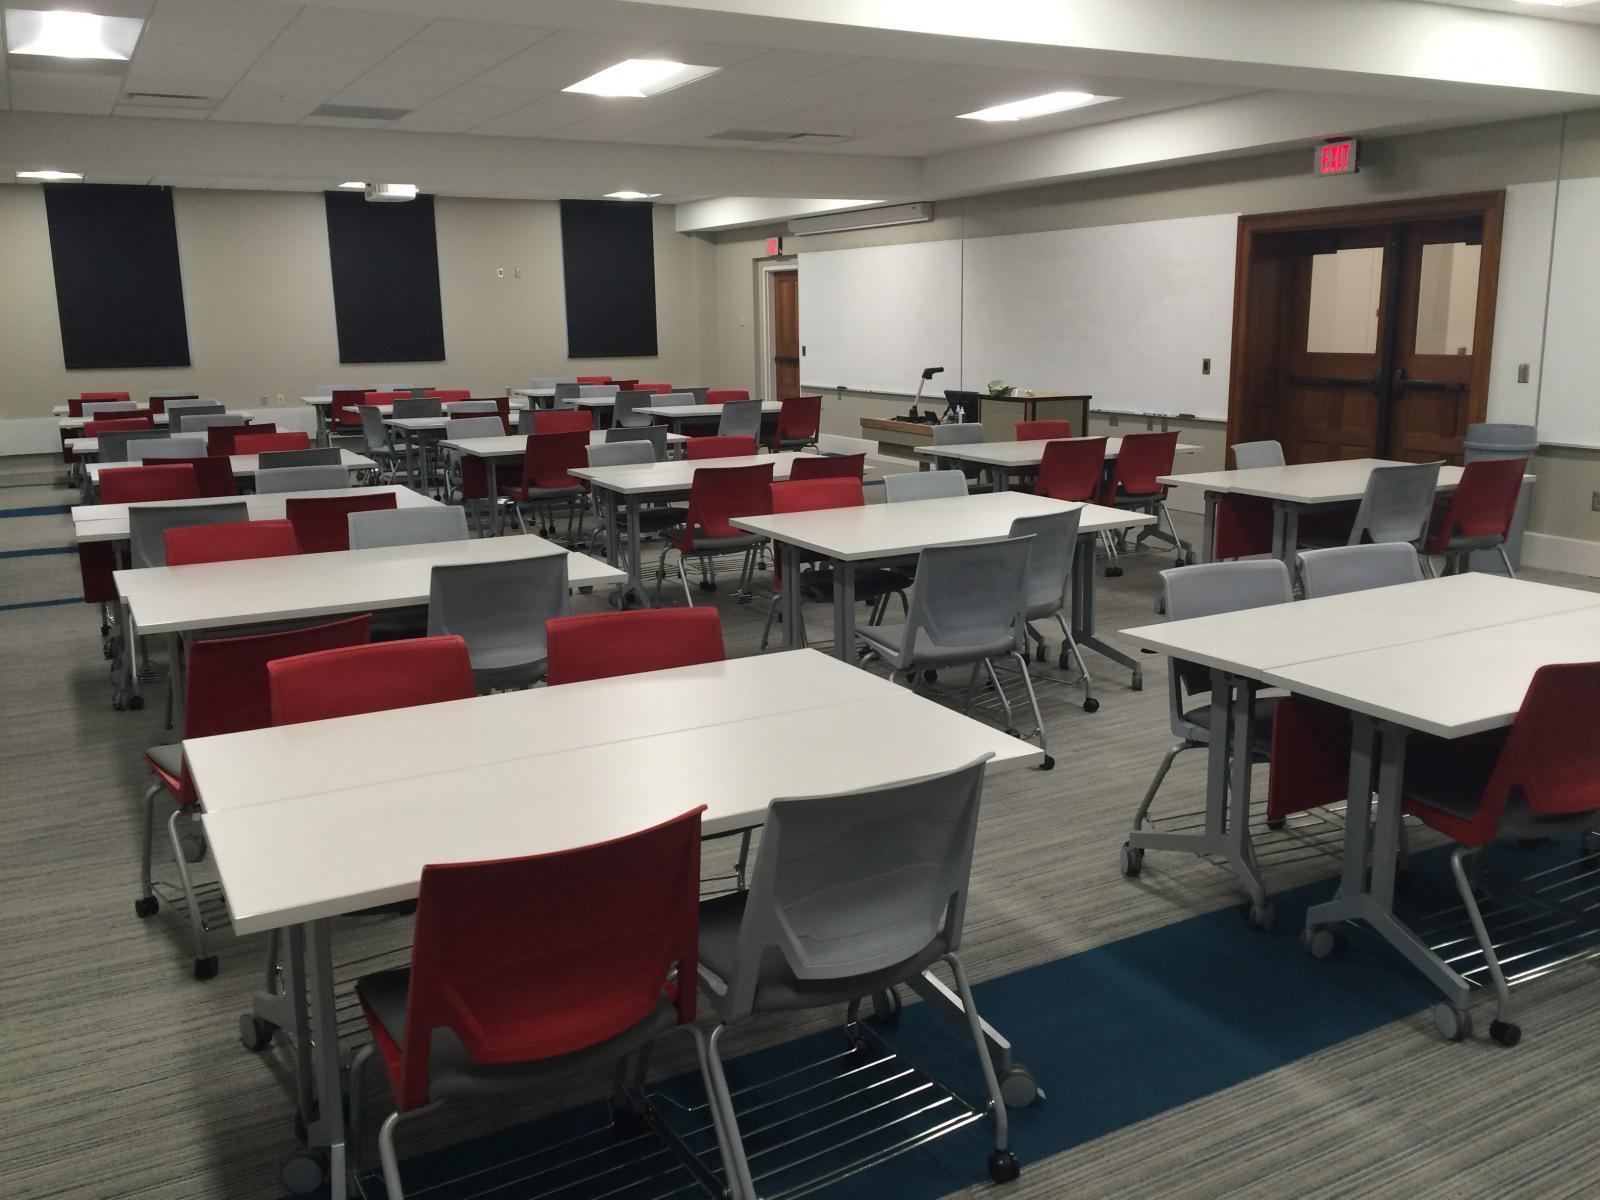 ... Training Table Unl General Purpose Classrooms